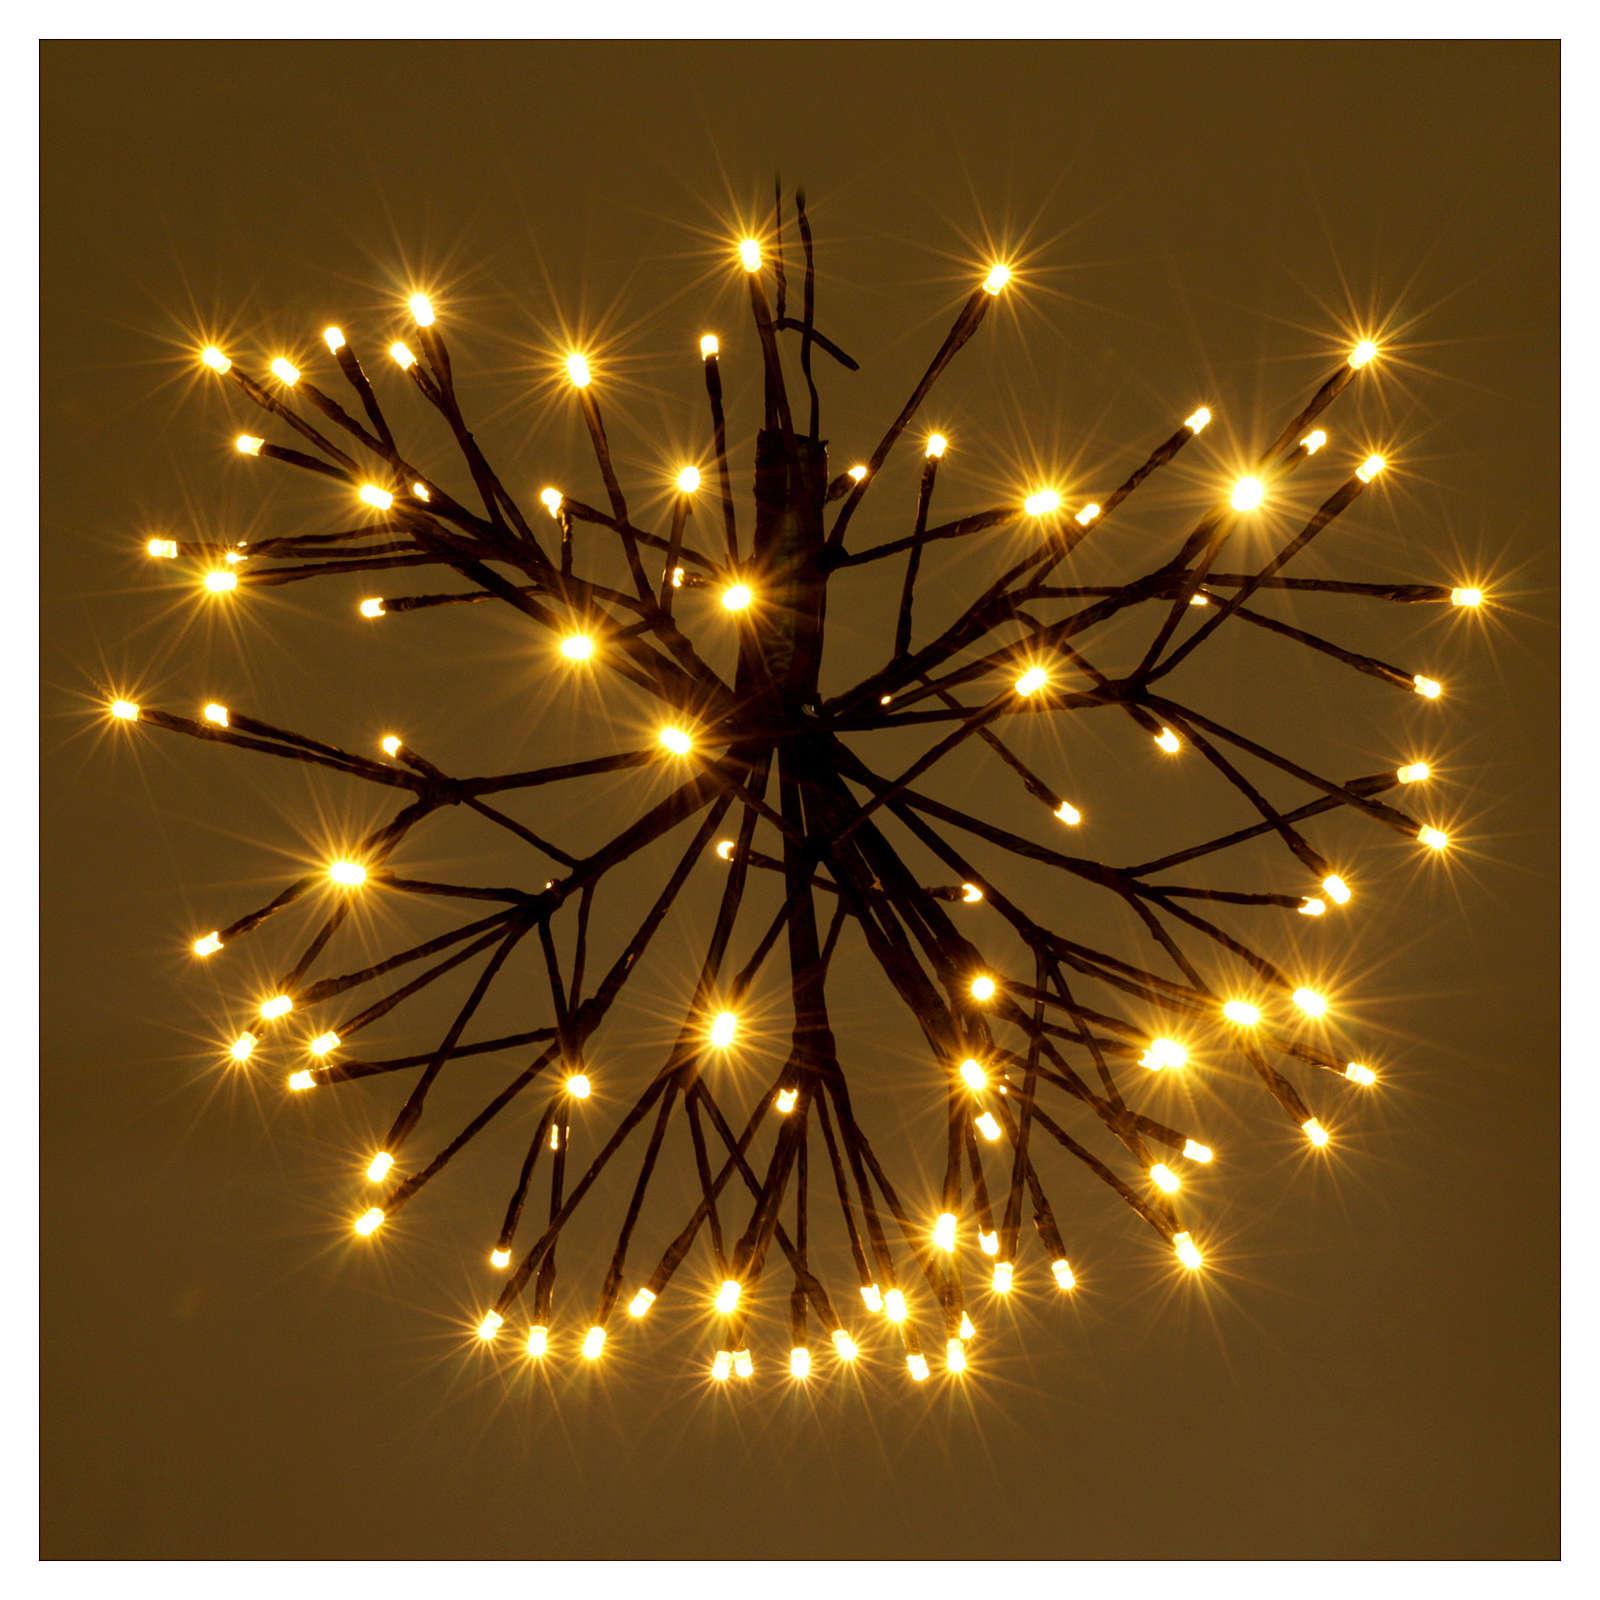 Christmas light firework effect 96 warm white Leds internal and external use 3